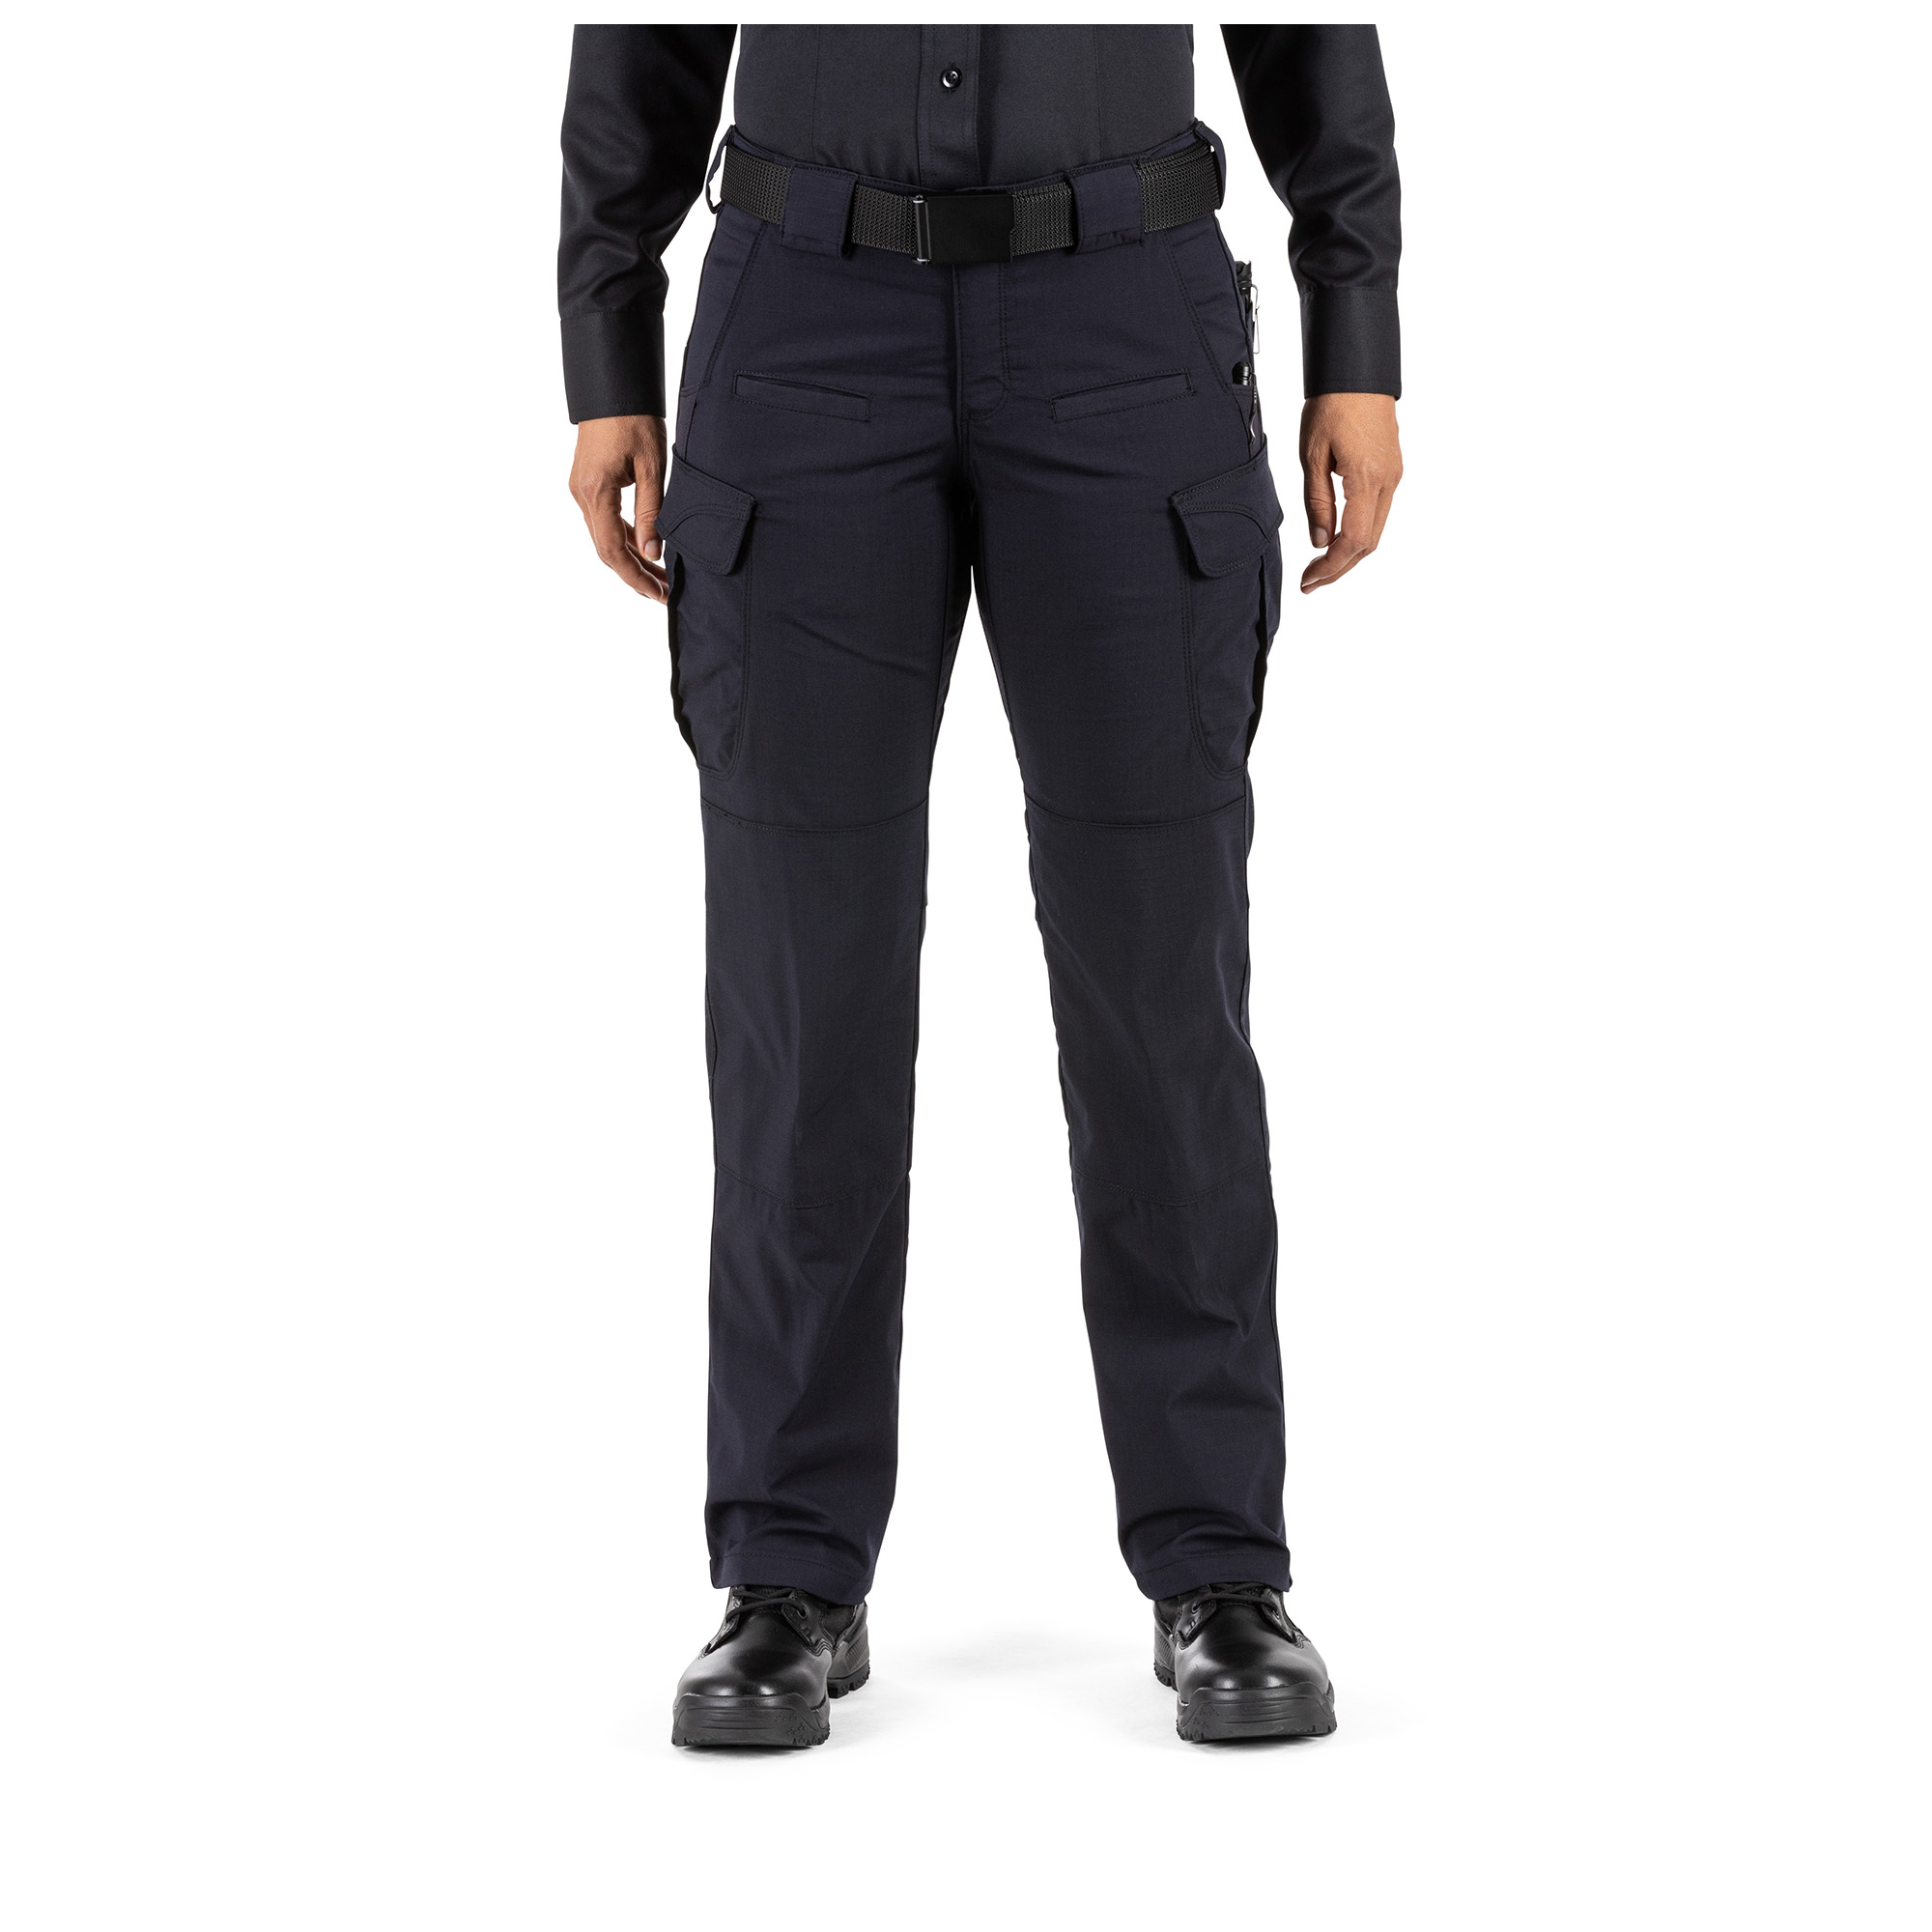 5.11 Tactical Women Womens NYPD Stryke Pant thumbnail